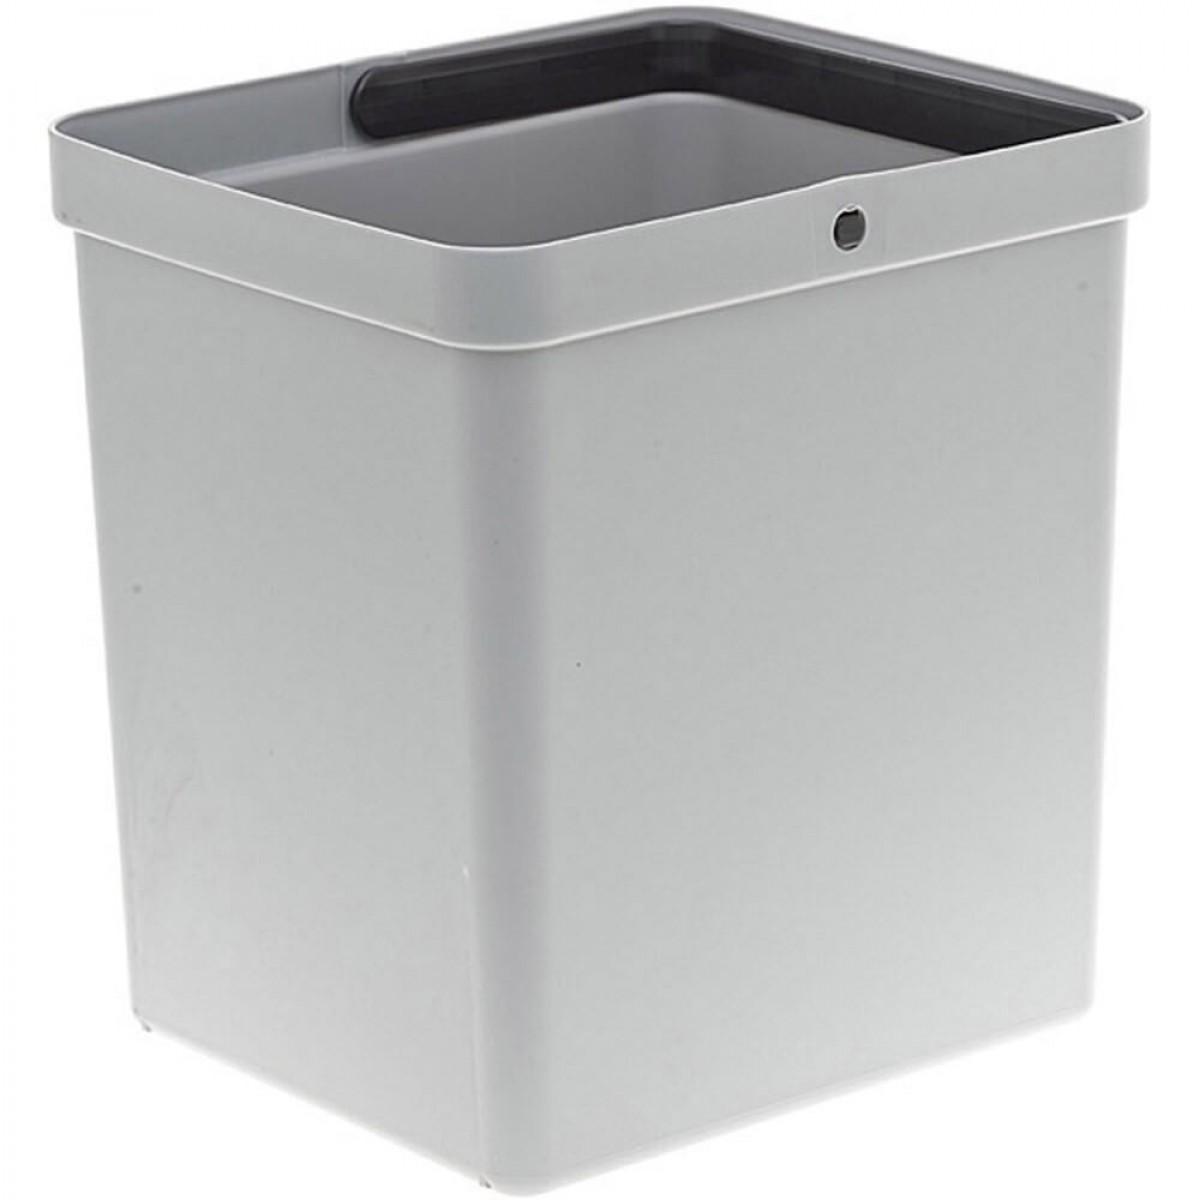 Affaldspand i grå plast - 15 ltr